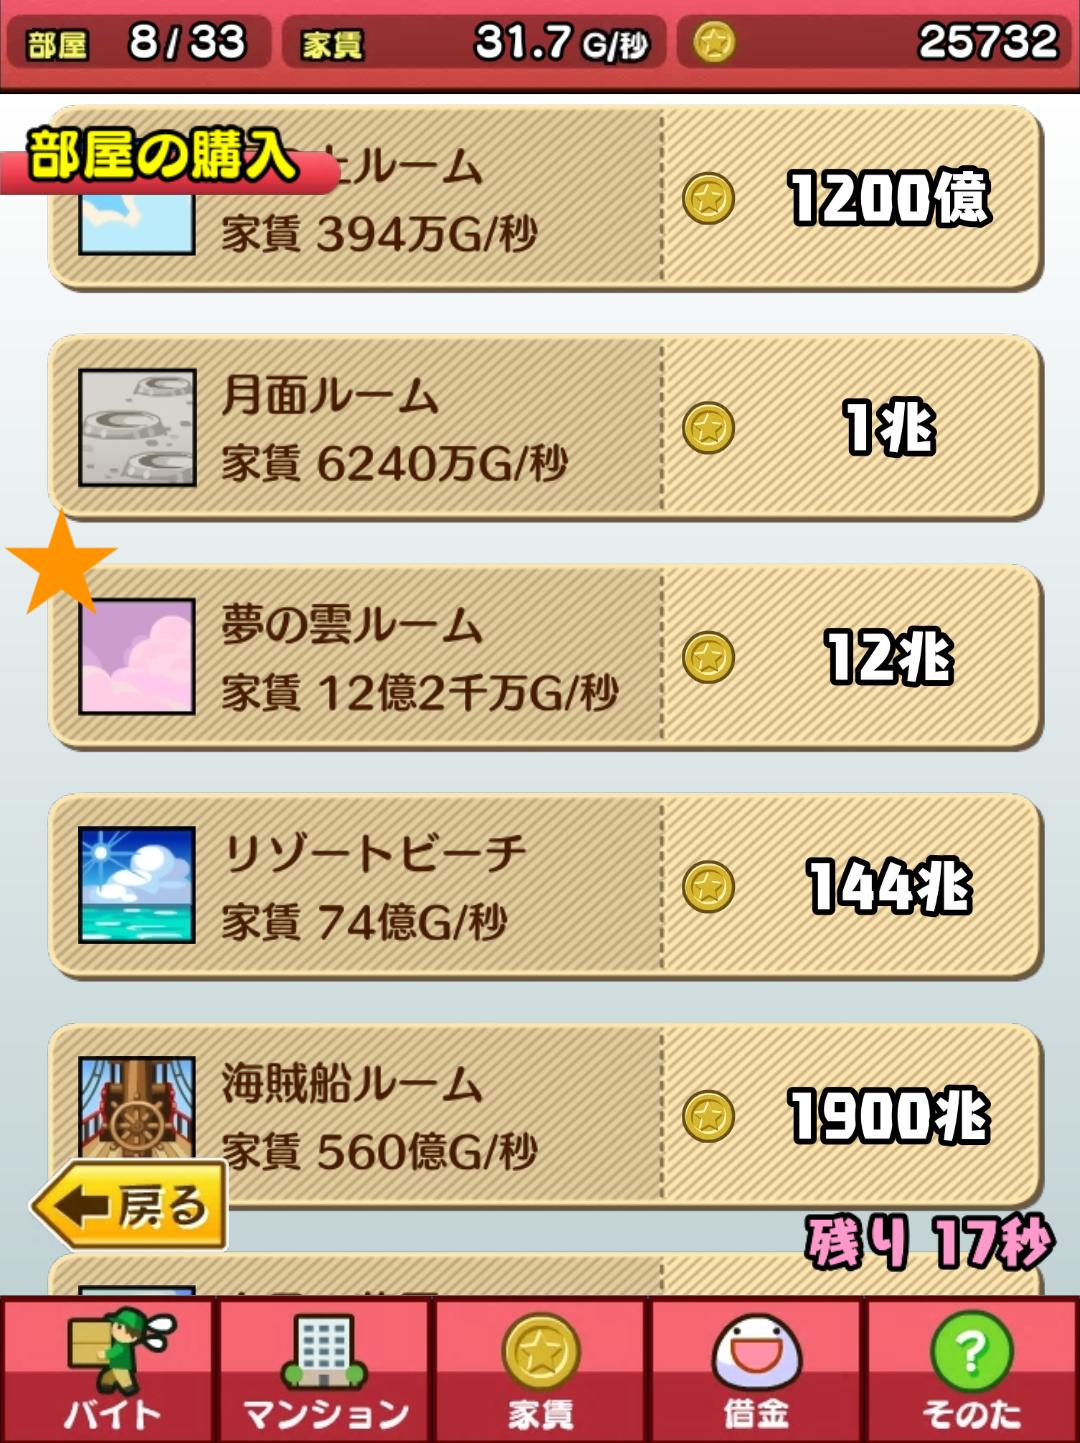 f:id:atsuhiro-me:20180117005121p:plain:w300